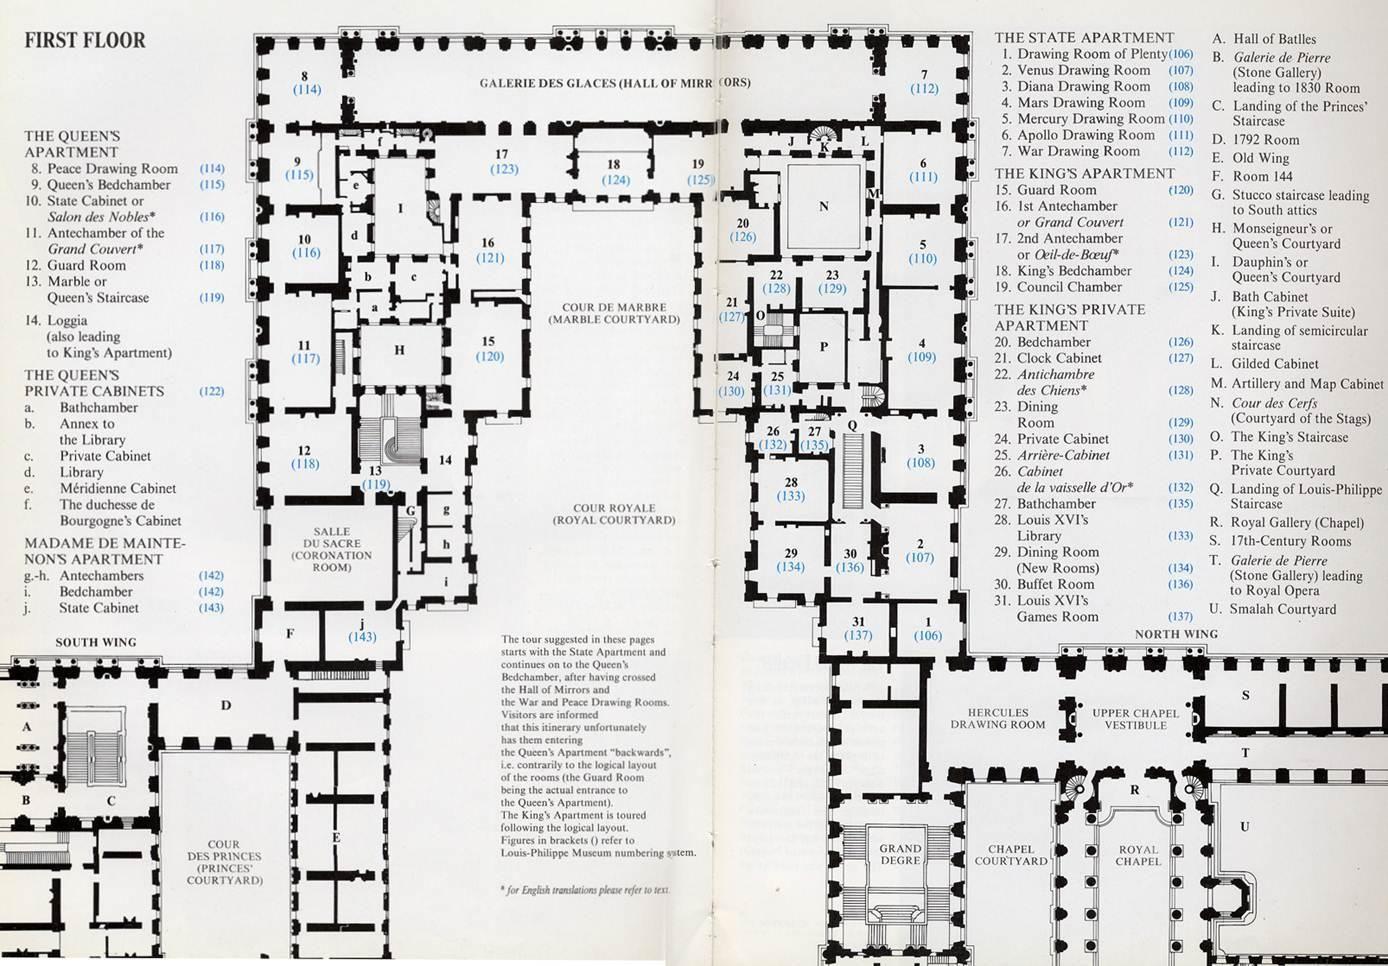 Palace Of Versailles Floor Plan Plan Of Palace Of Versailles Piano Nobile How To Plan Castle Floor Plan Floor Plans